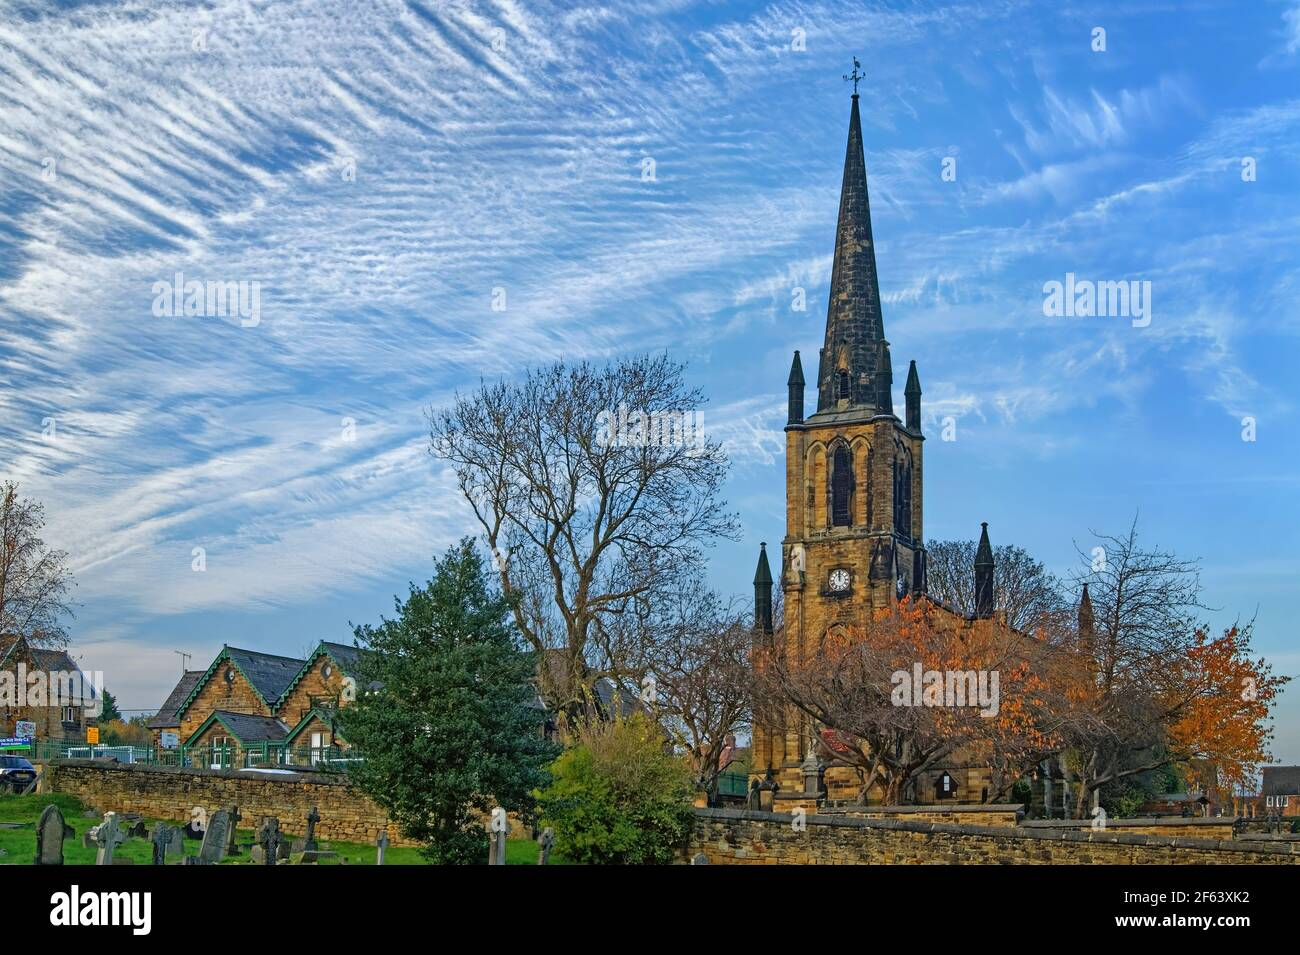 UK,South Yorkshire,Elsecar,Holy Trinity Parish Church in Autumn Stock Photo